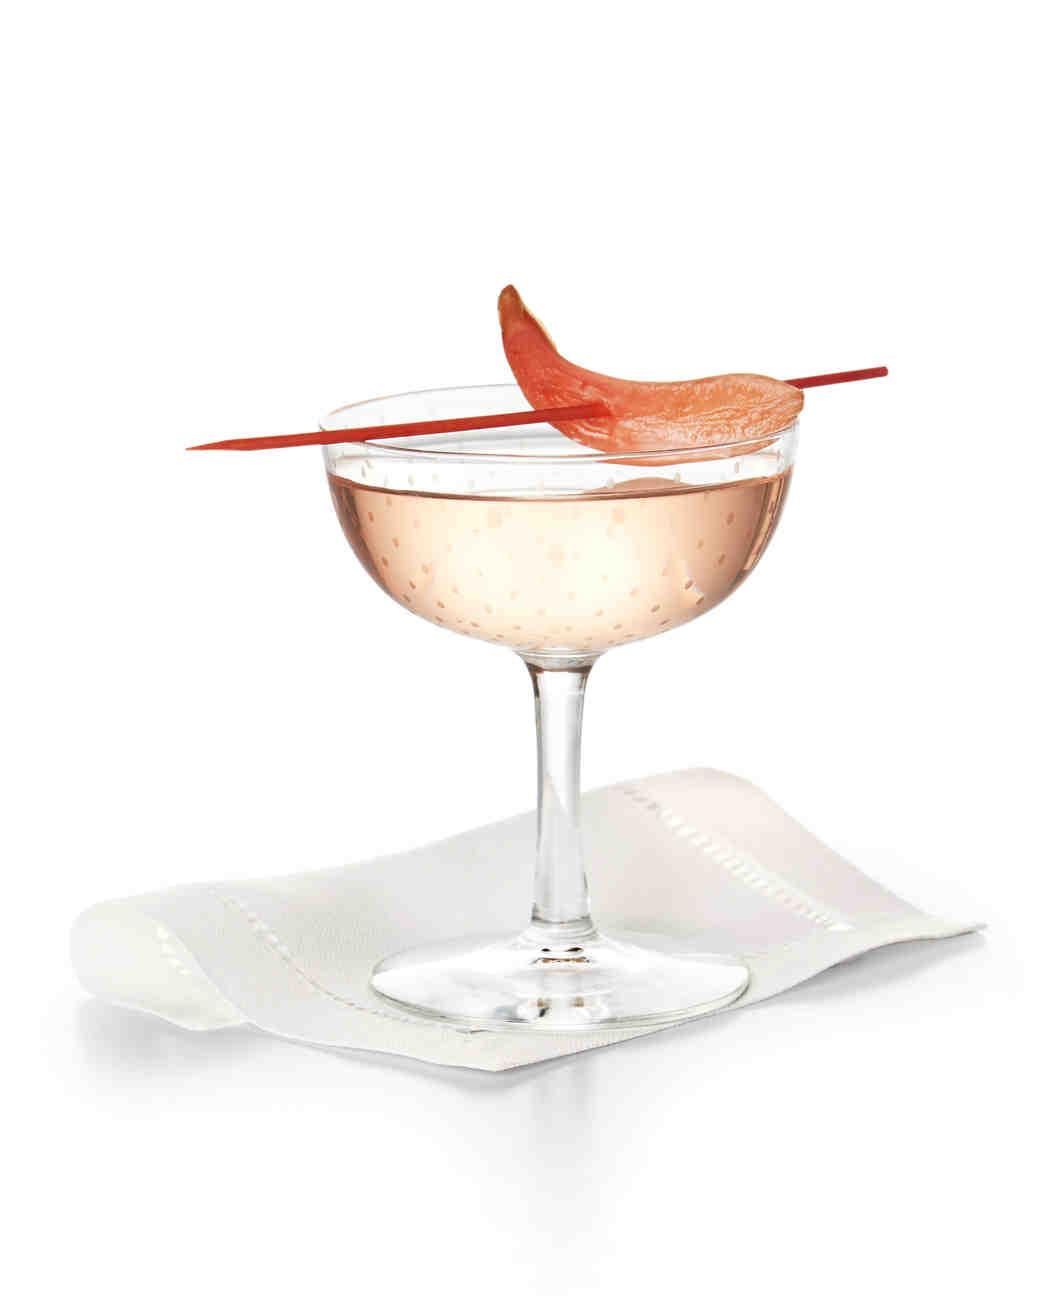 cocktail-080-mwd110795.jpg